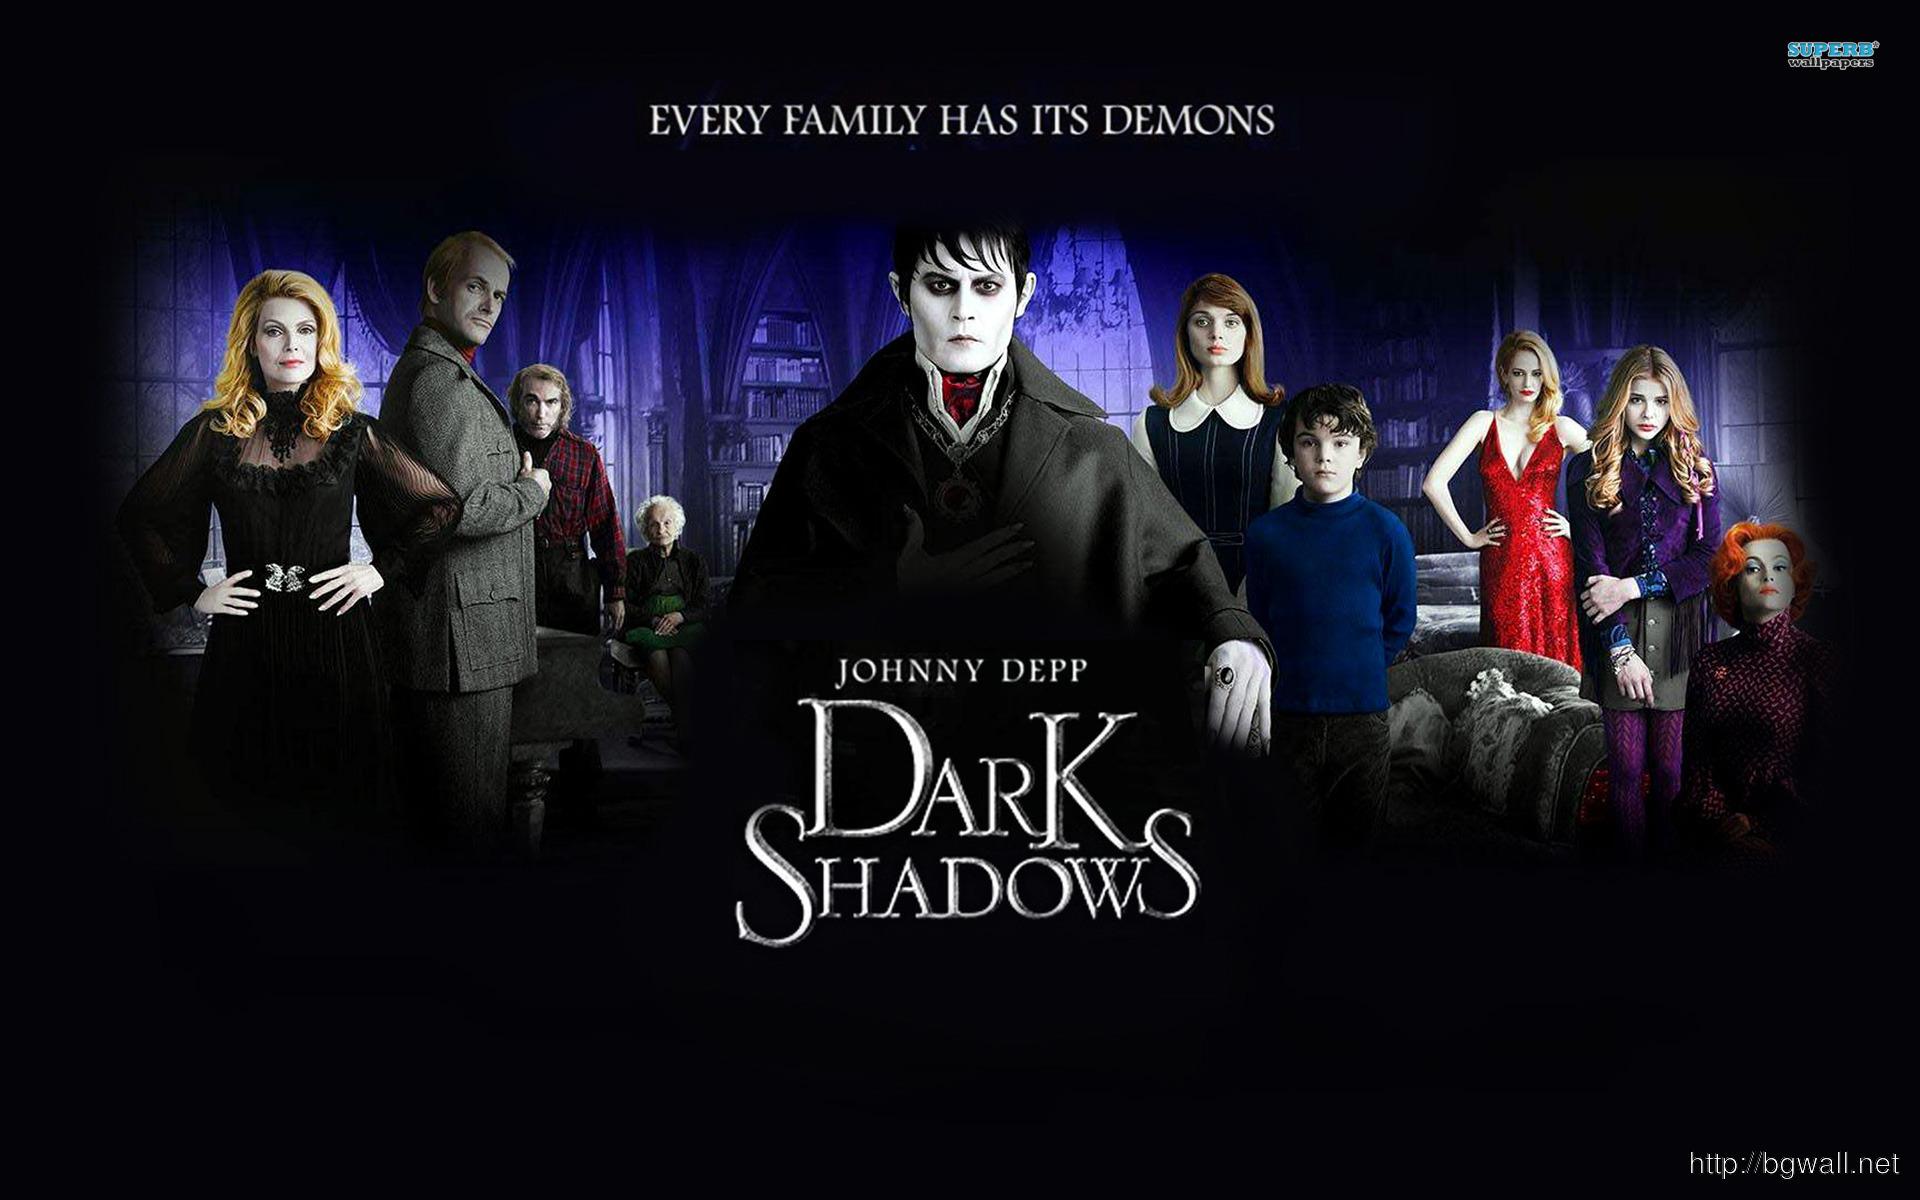 Dark Shadows Wallpaper Background Wallpaper Hd